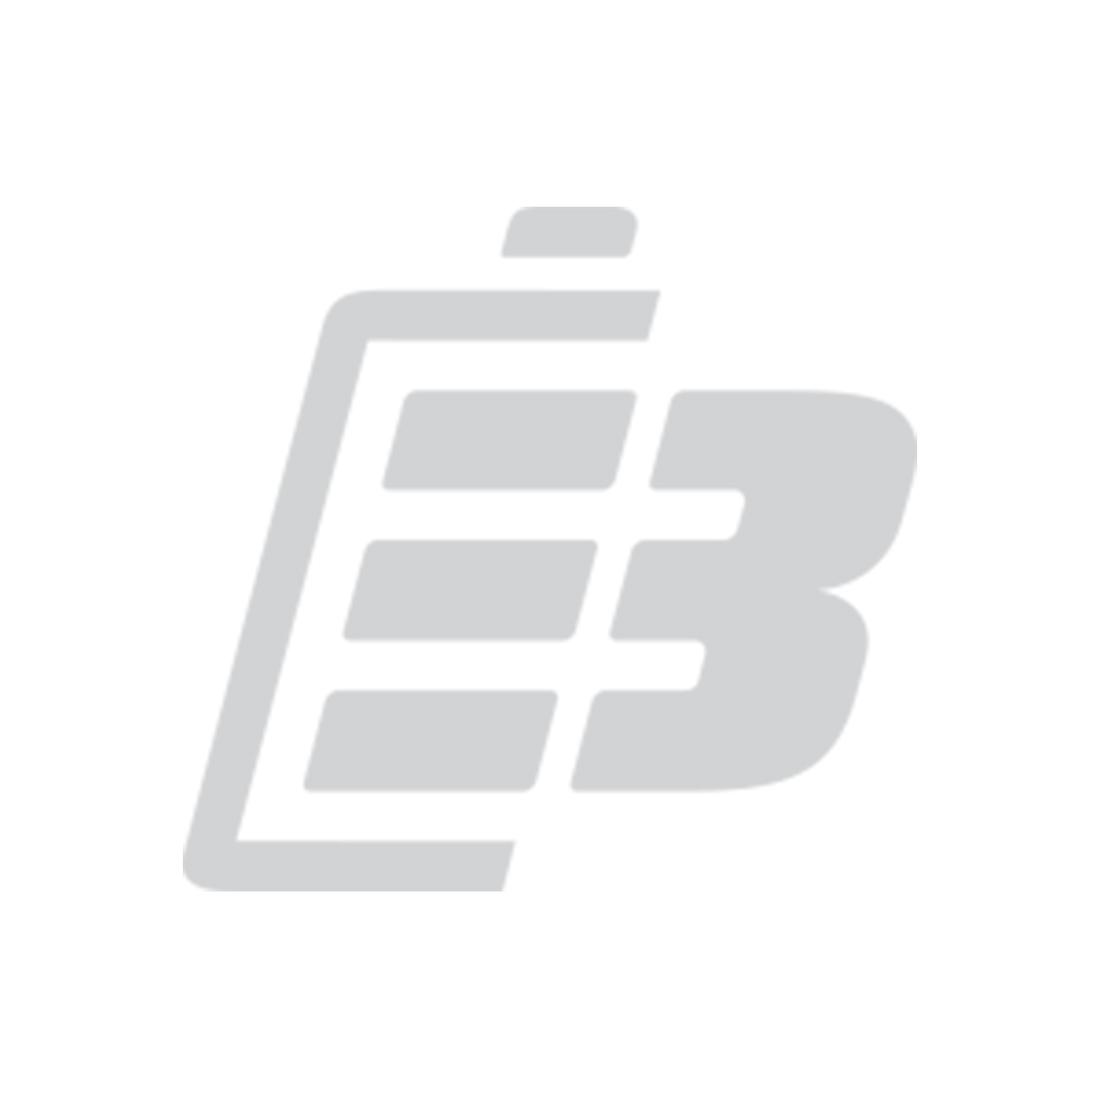 Cordless phone battery Panasonic 30AAAM3BMX_1